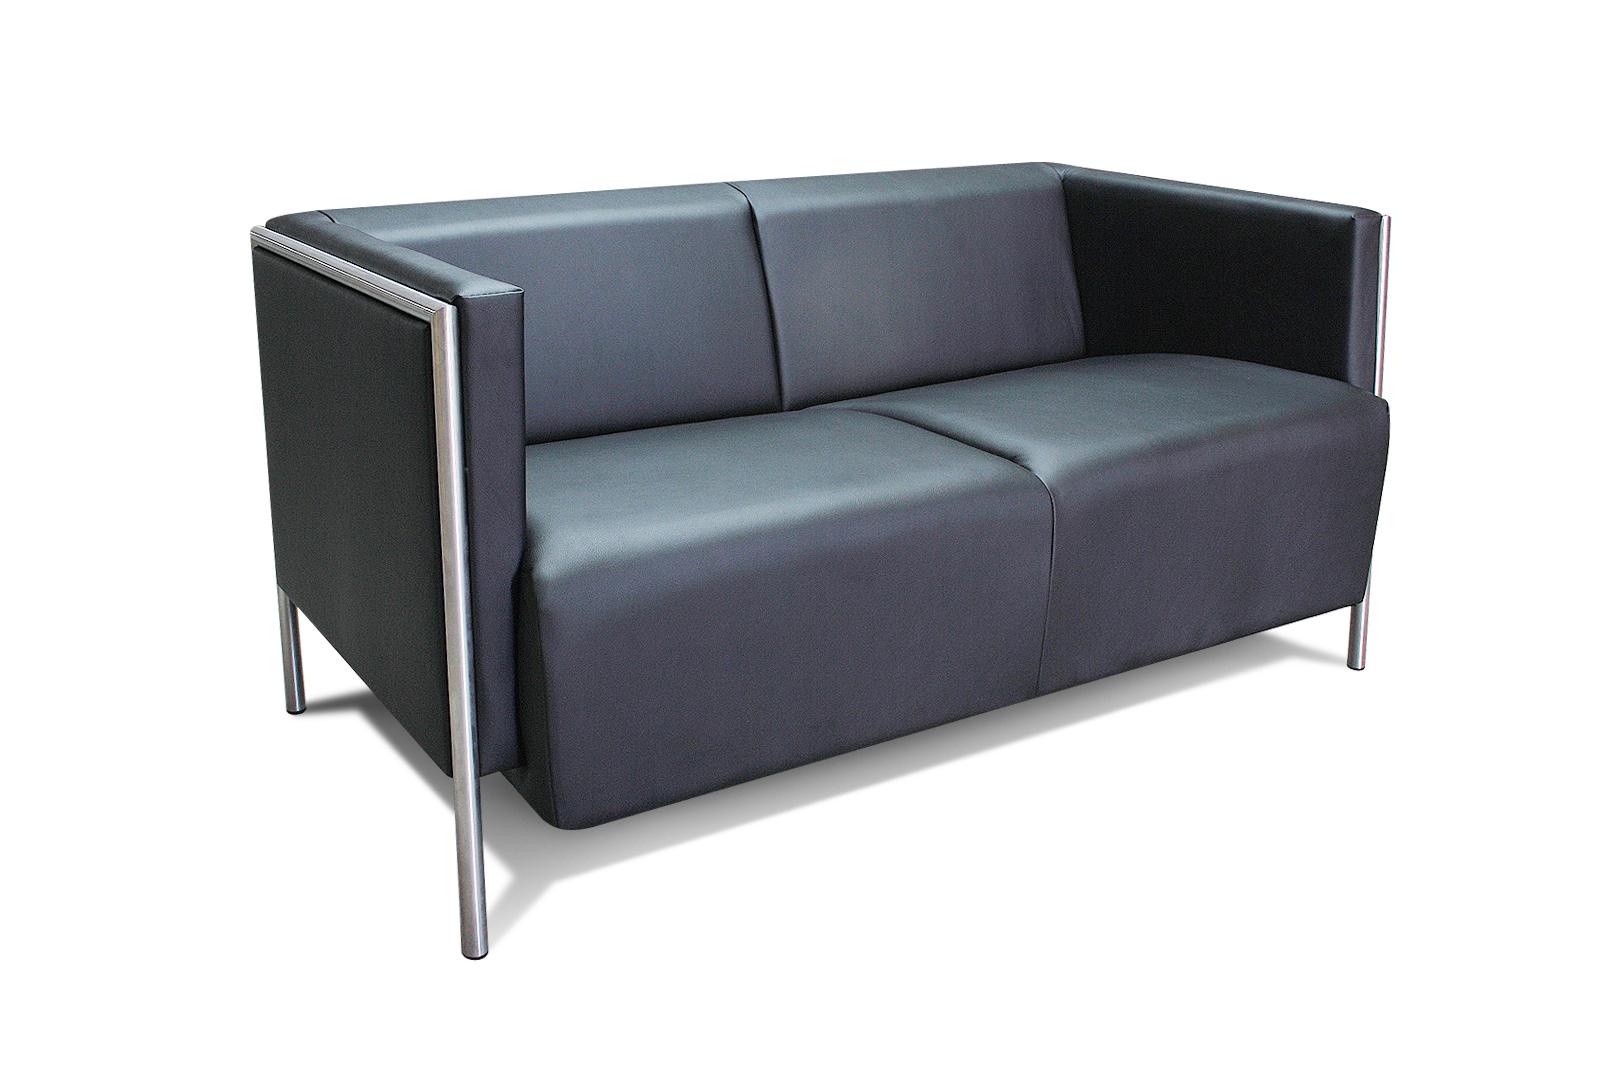 kempiński sofa meble zestaw tapicerowane